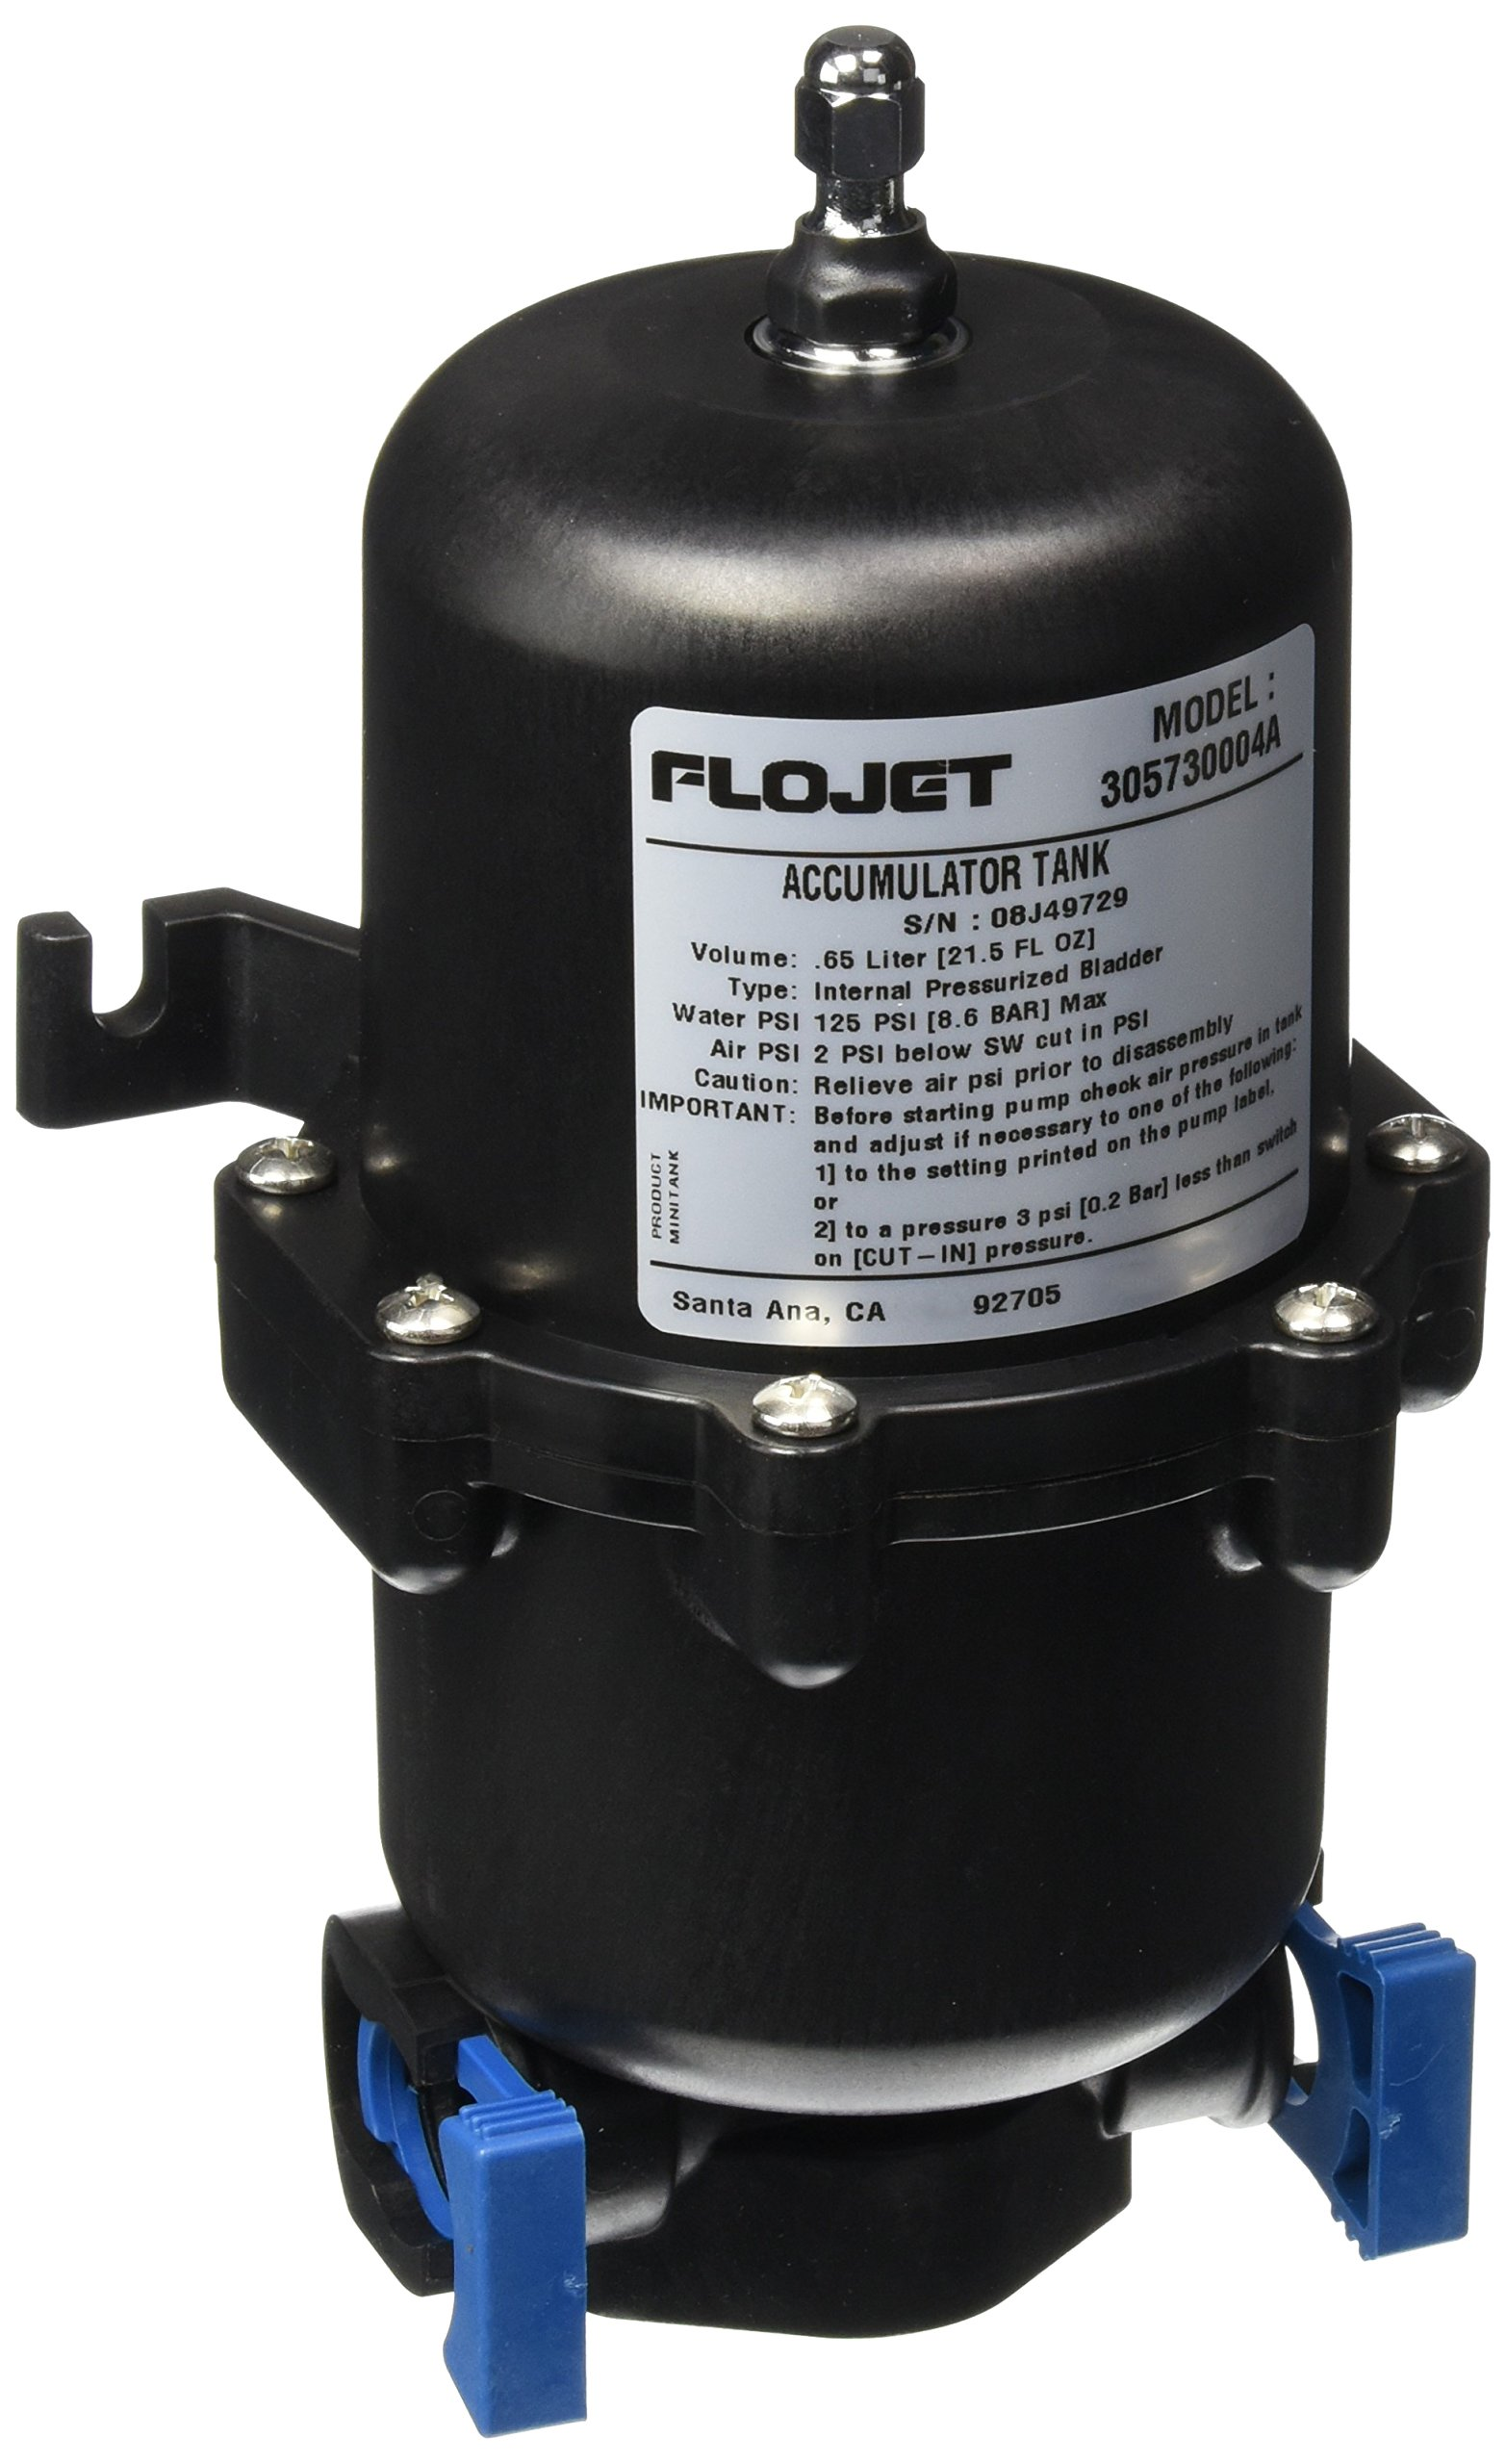 Flojet 305730004A Accumulator Tank by Flojet